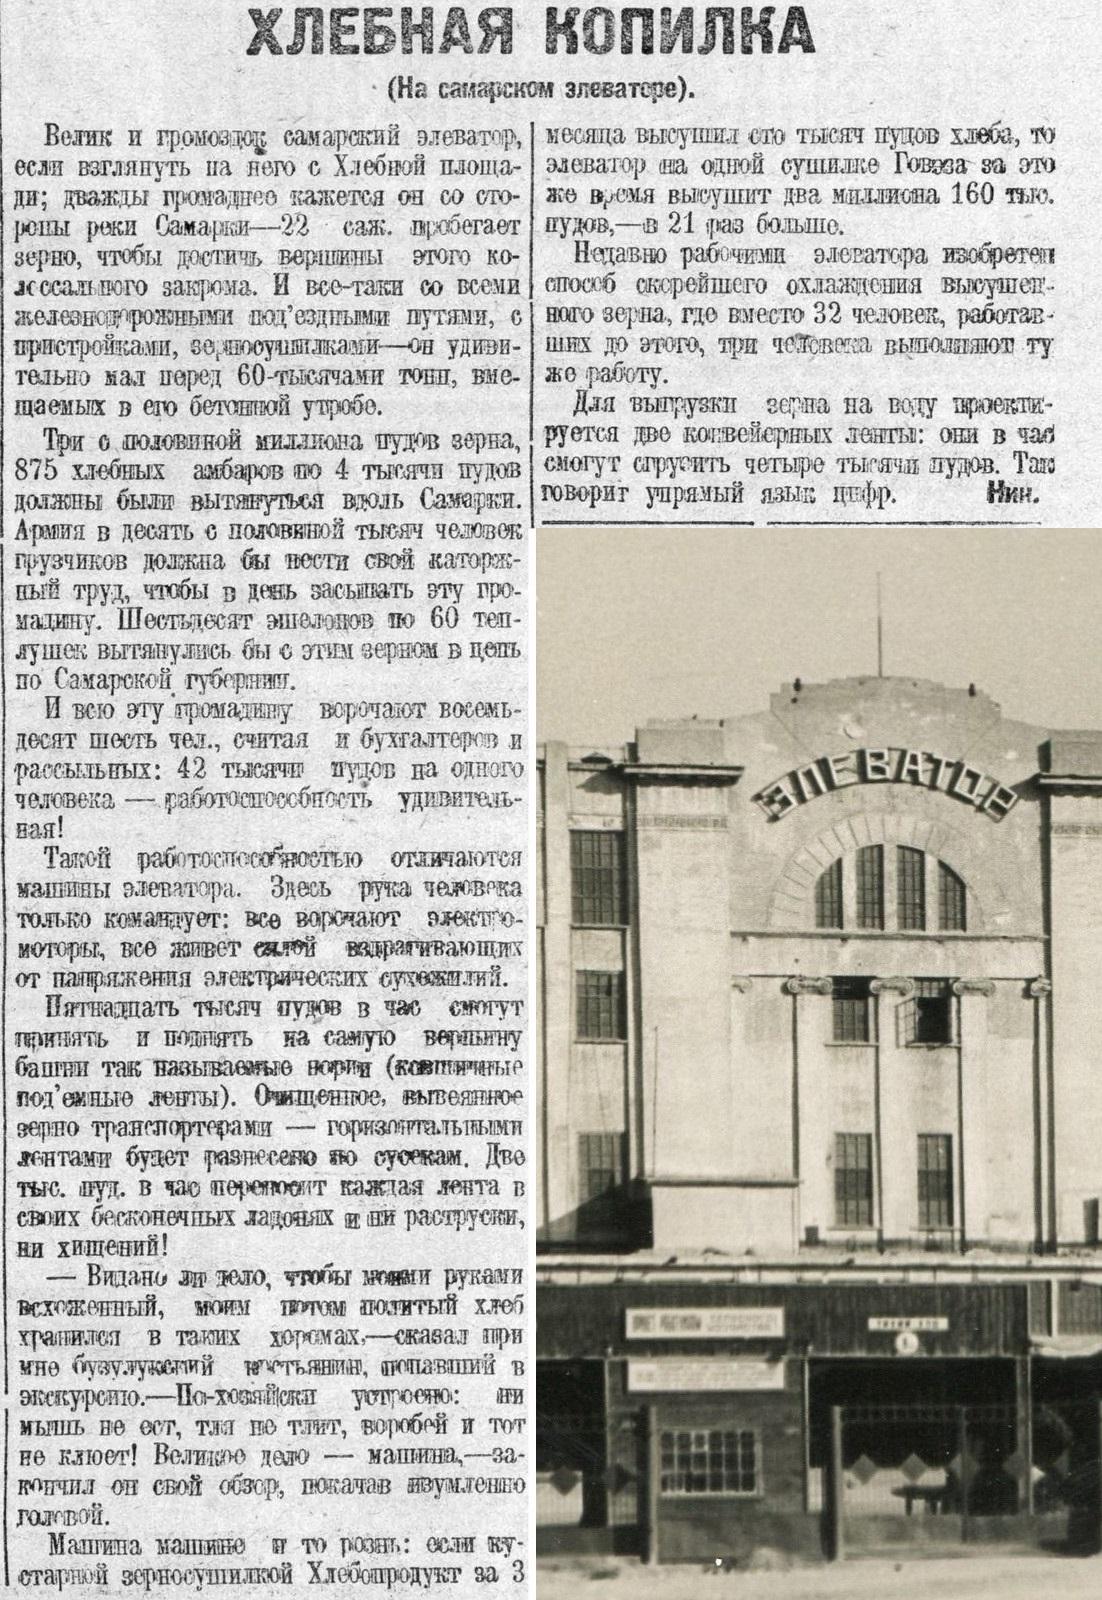 ВКа-1927-09-18-на элеваторе-001